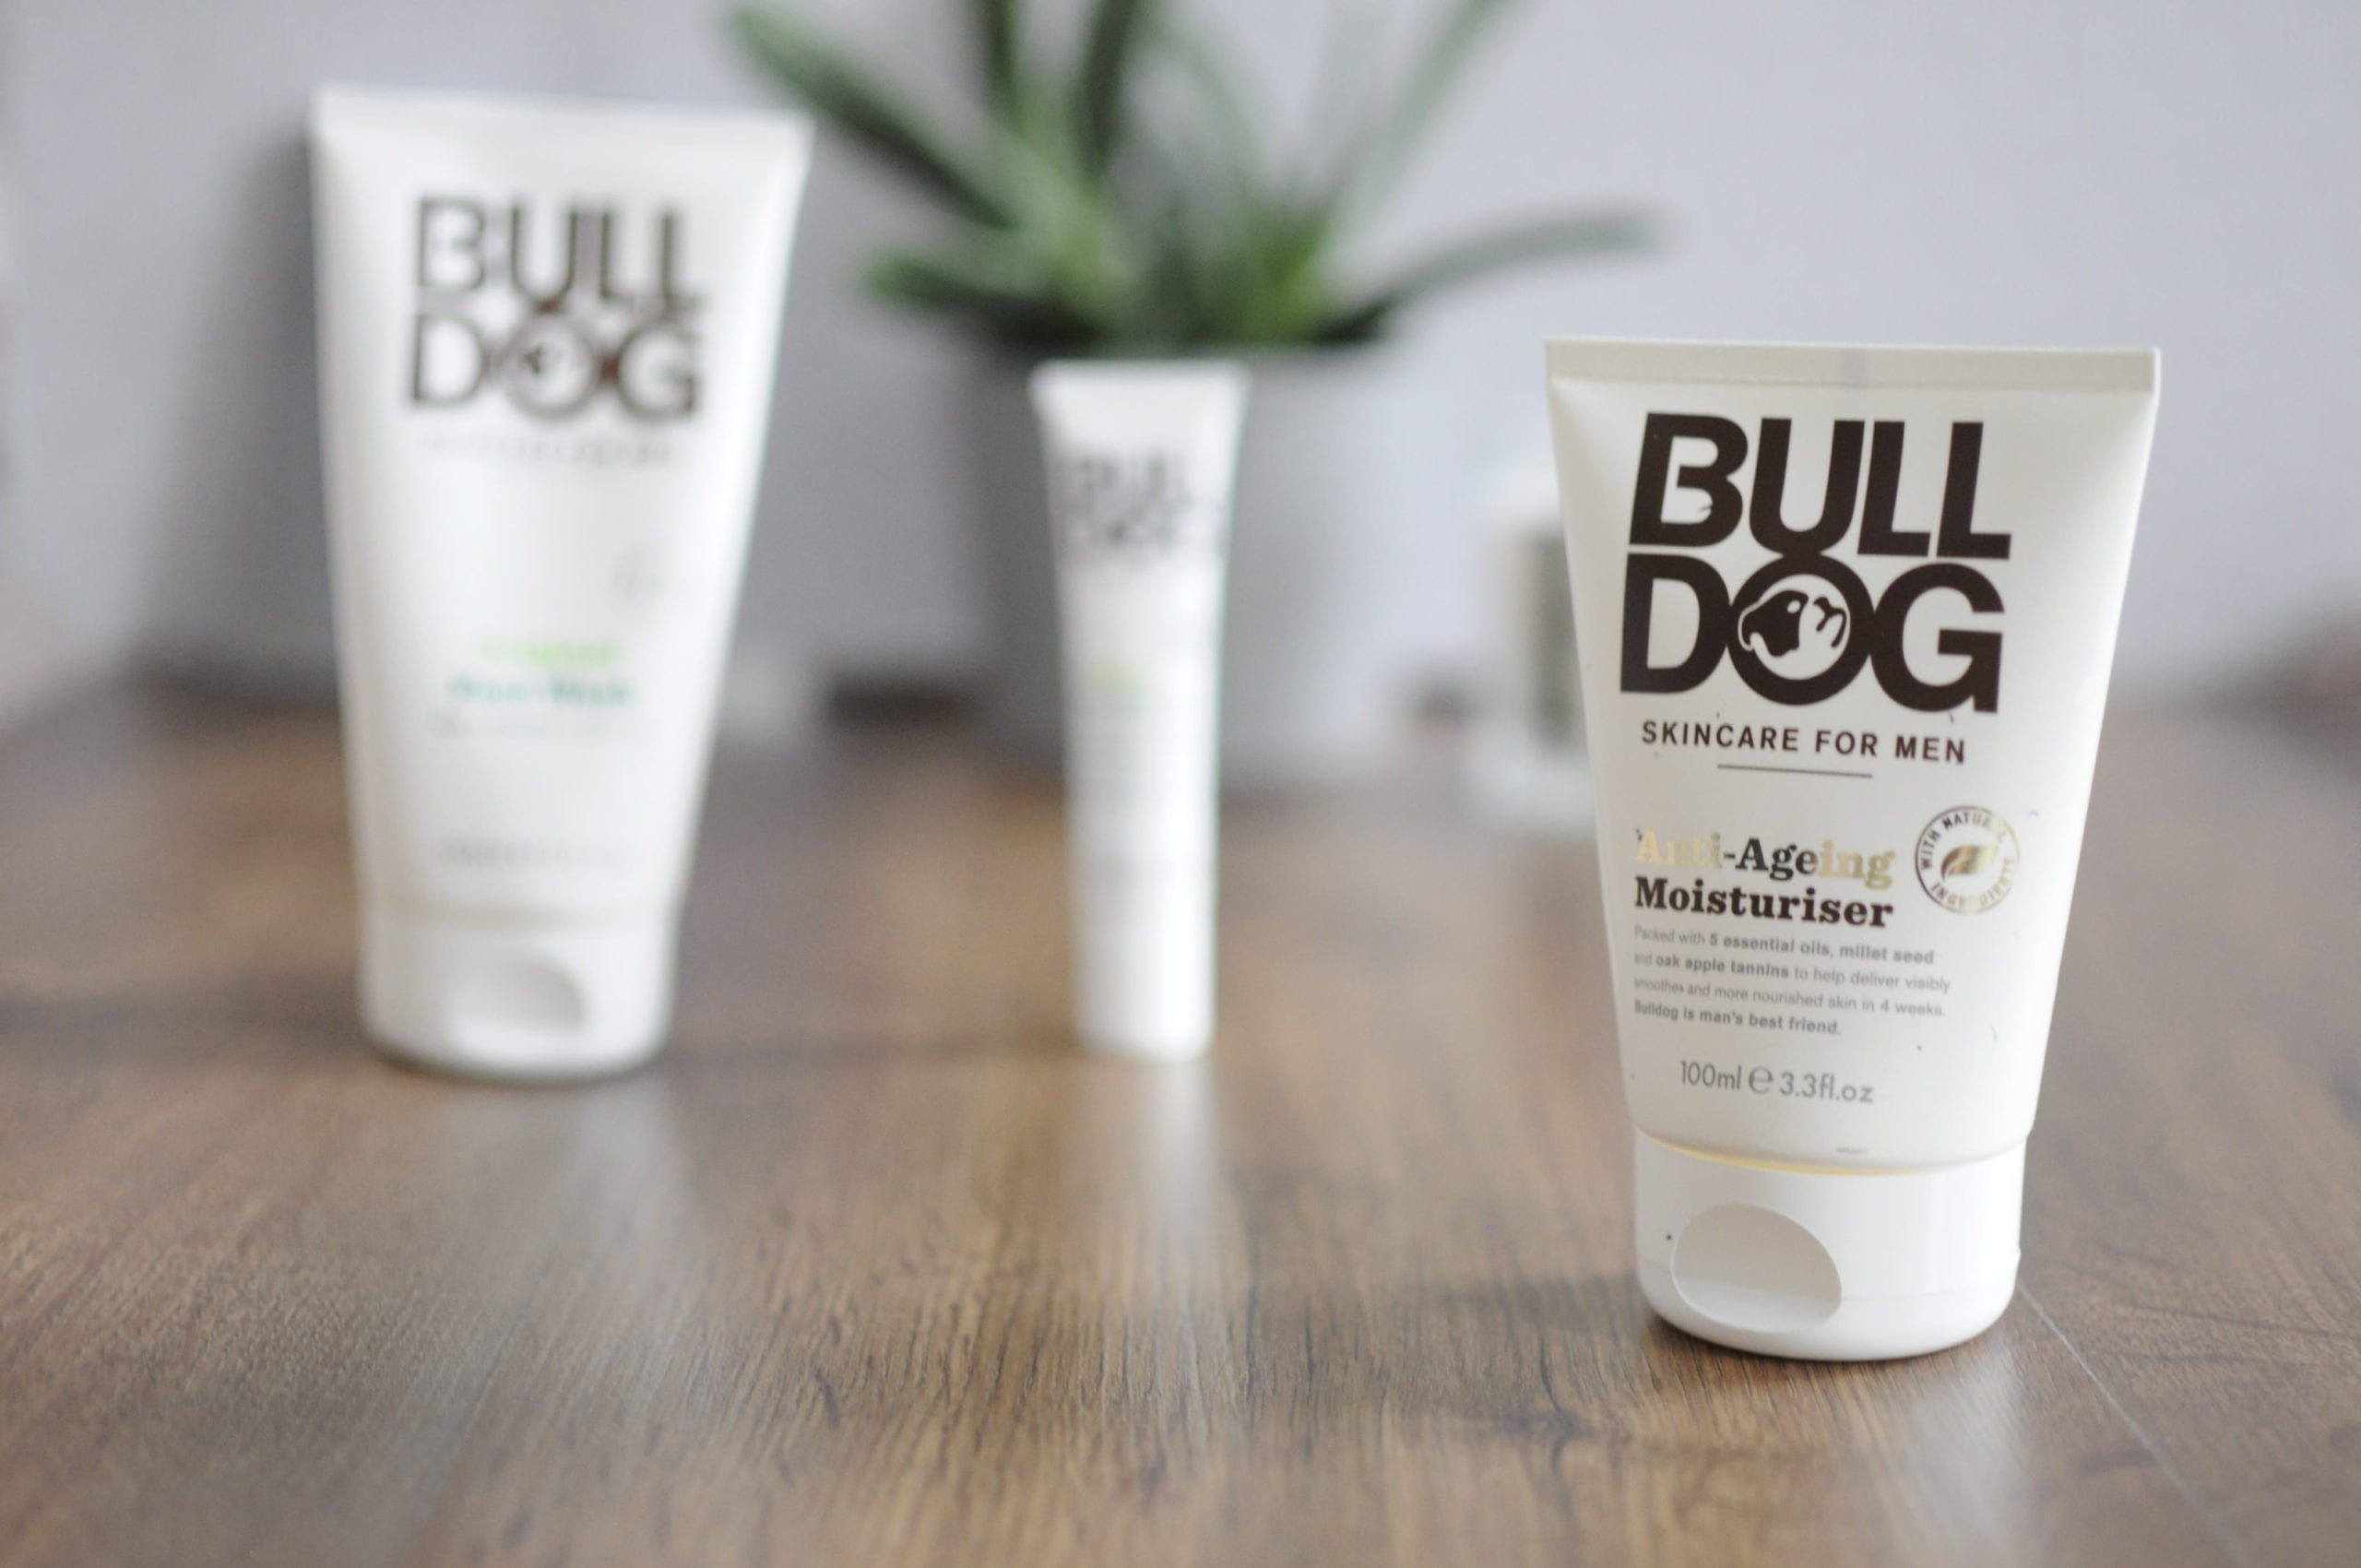 Bulldog skin care Anti Ageing